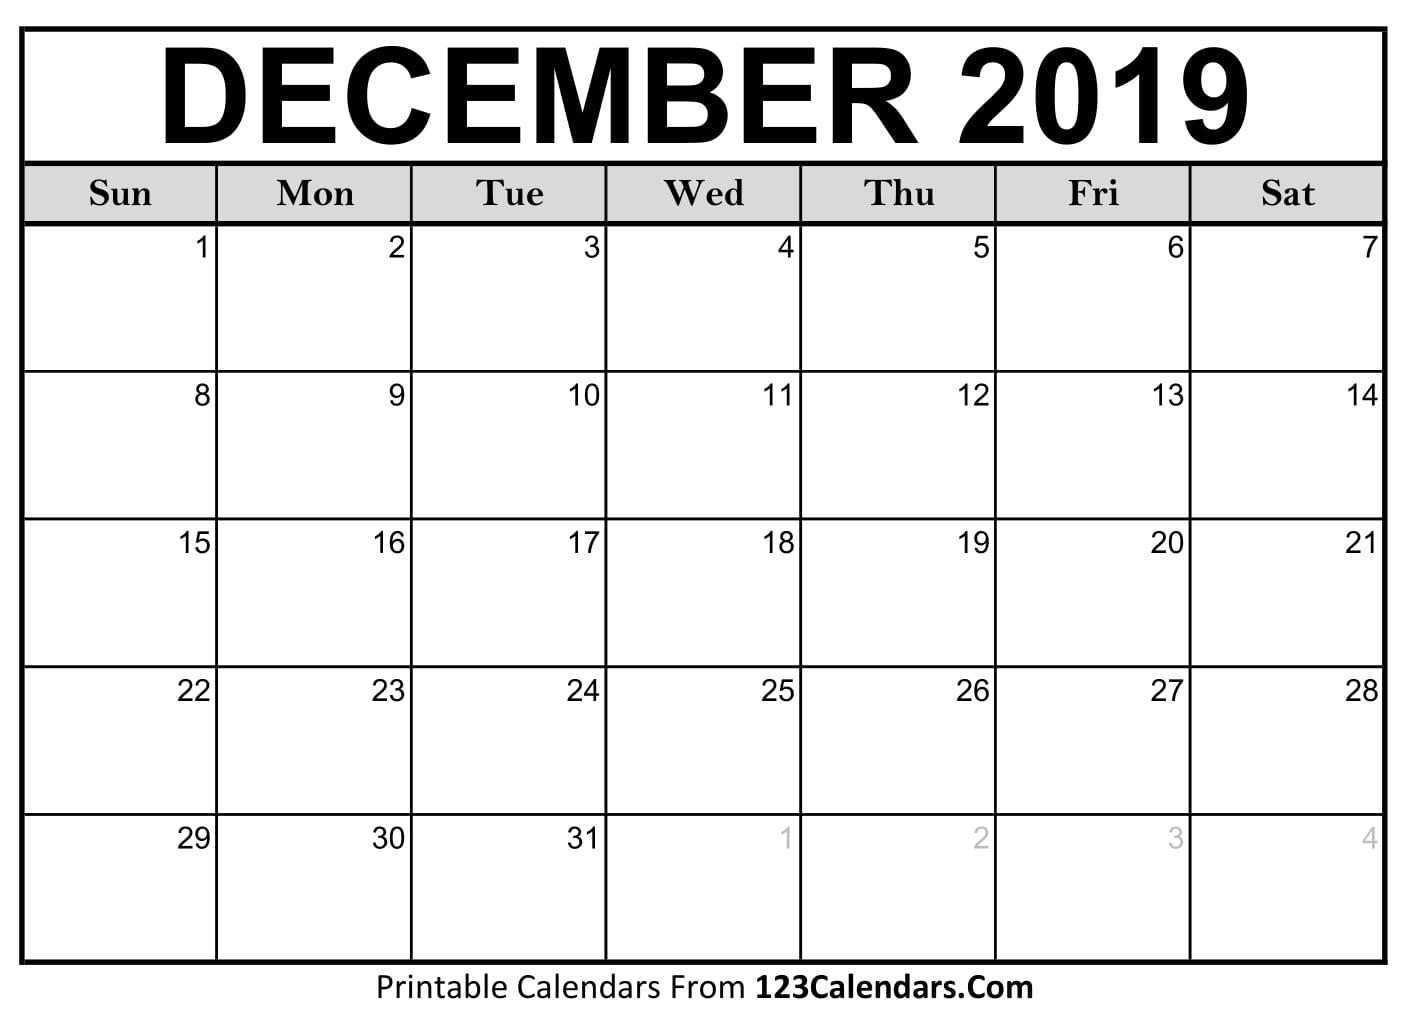 December 2019 Printable Calendar | 123Calendars regarding December Blank Calendar Printable